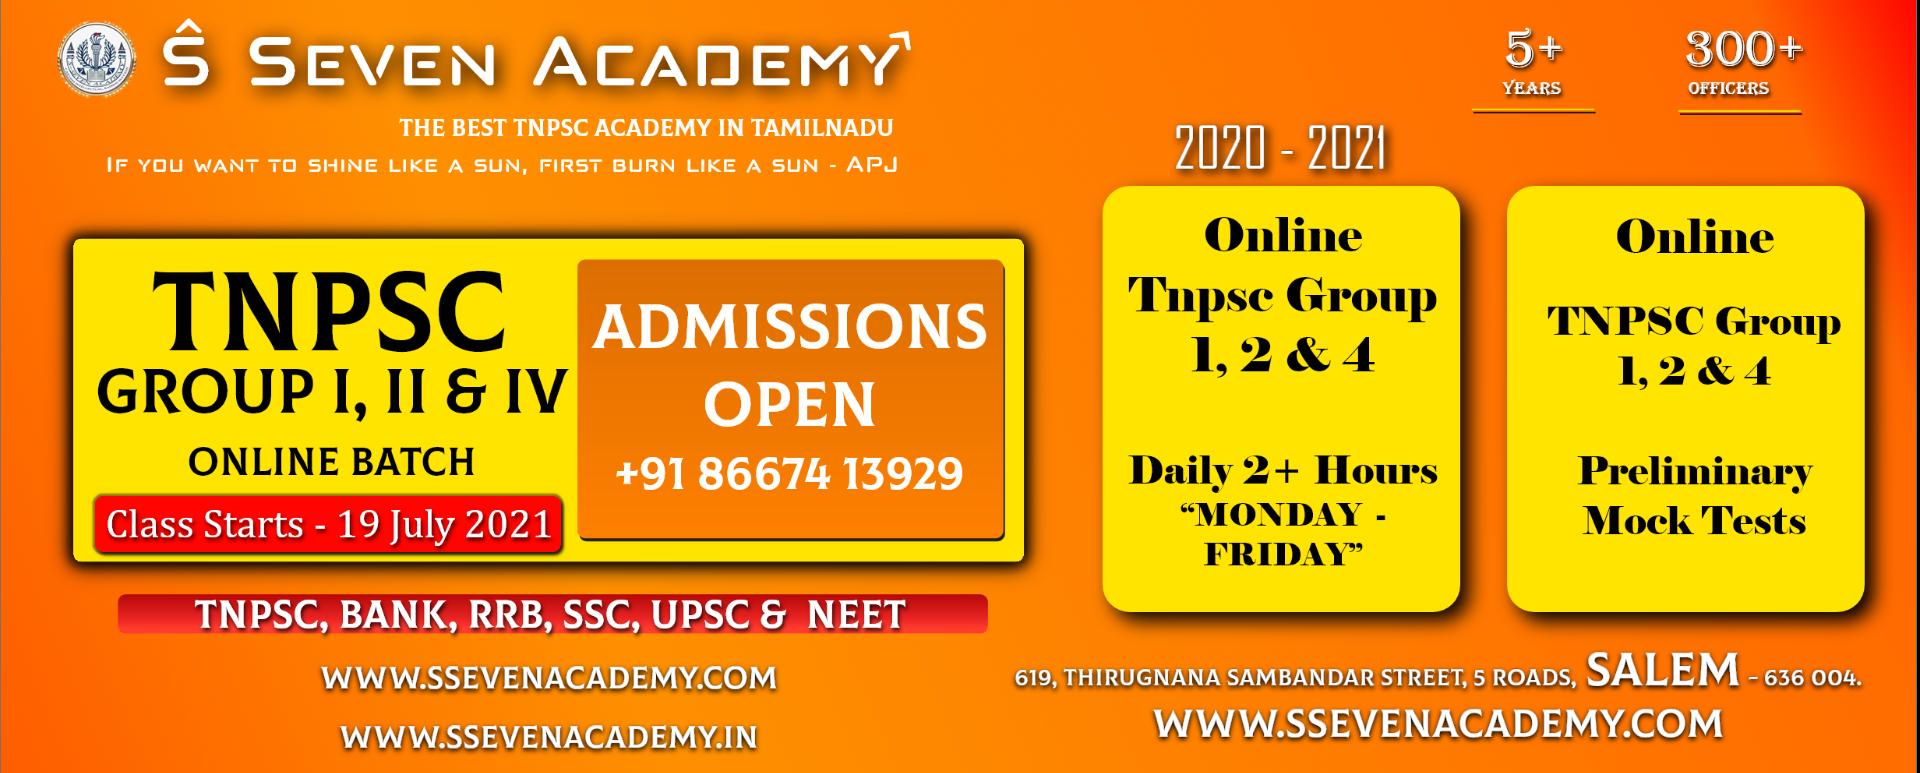 TNPSC Online Coaching Classes in salem, TNPSC Online, Online Classes, TNPSC Exams with our Online Classes from your home, TNPSC Online coaching for Group I, TNPSC Live Video Class, Books, Test Series in Tamil & English, Online Coaching Classes, TNPSC online course, TNPSC Online Classes, Crack TNPSC Group I II IIA IV VAO Exams, tnpsc group 4 free online classes, tnpsc online coaching videos, free online classes for tnpsc group 2, tnpsc free coaching by government, best tnpsc coaching centre in tamilnadu, Live classes, TNPSC ONLINE CLASS PROGRAM for GROUP I, Tnpsc Group 1 online Coaching Centre, TNPSC online coaching classes for Group 2 in this section, Best TNPSC Coaching Institutes, Full Online Video Course + Test + Study Material, Best Online Coaching for TNPSC in TamilNadu, Online Application Online Test, online LIVE classes, TNPSC Group I,, tnpsc coaching centre in salem, tnpsc coaching centre